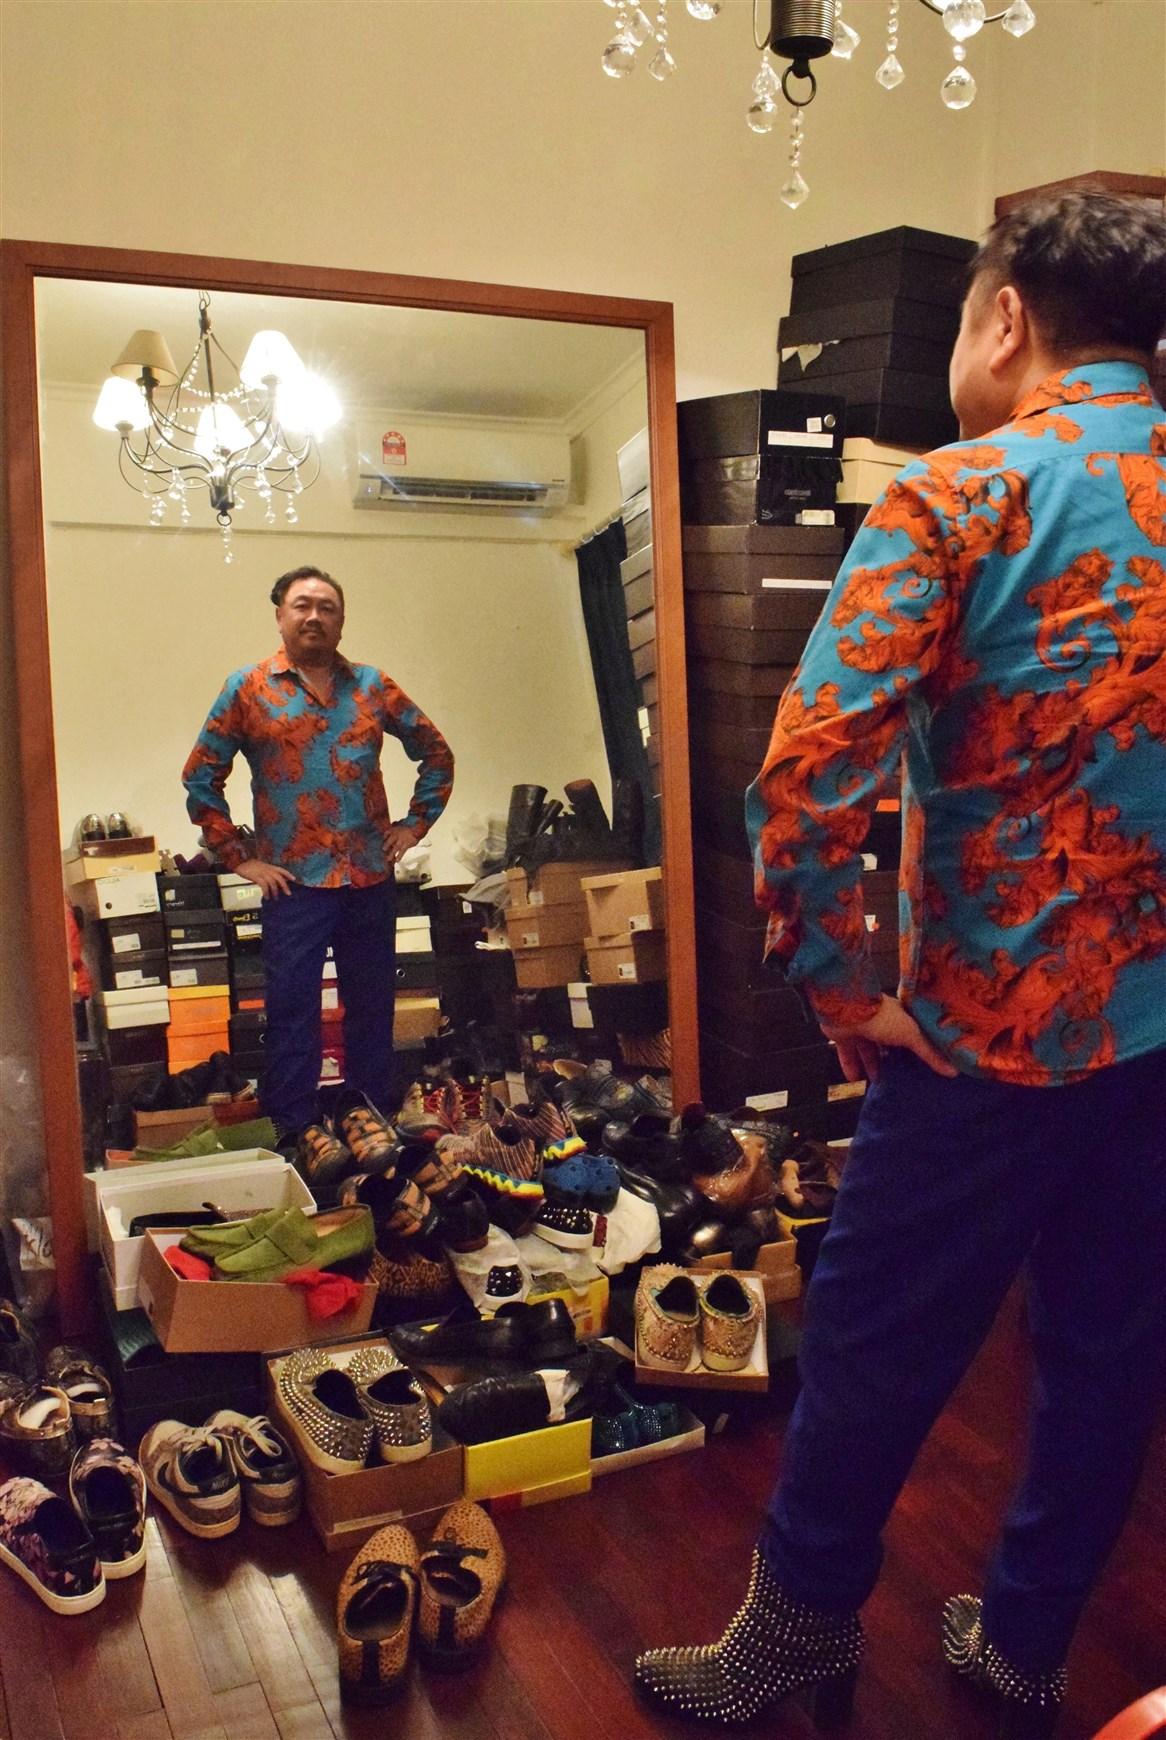 profile of datuk gordon leong, bohemian, boho-chic apartment, interview with datuk gordon leong, designer shoes, Louboutin men's shoes, Gucci men's shoes